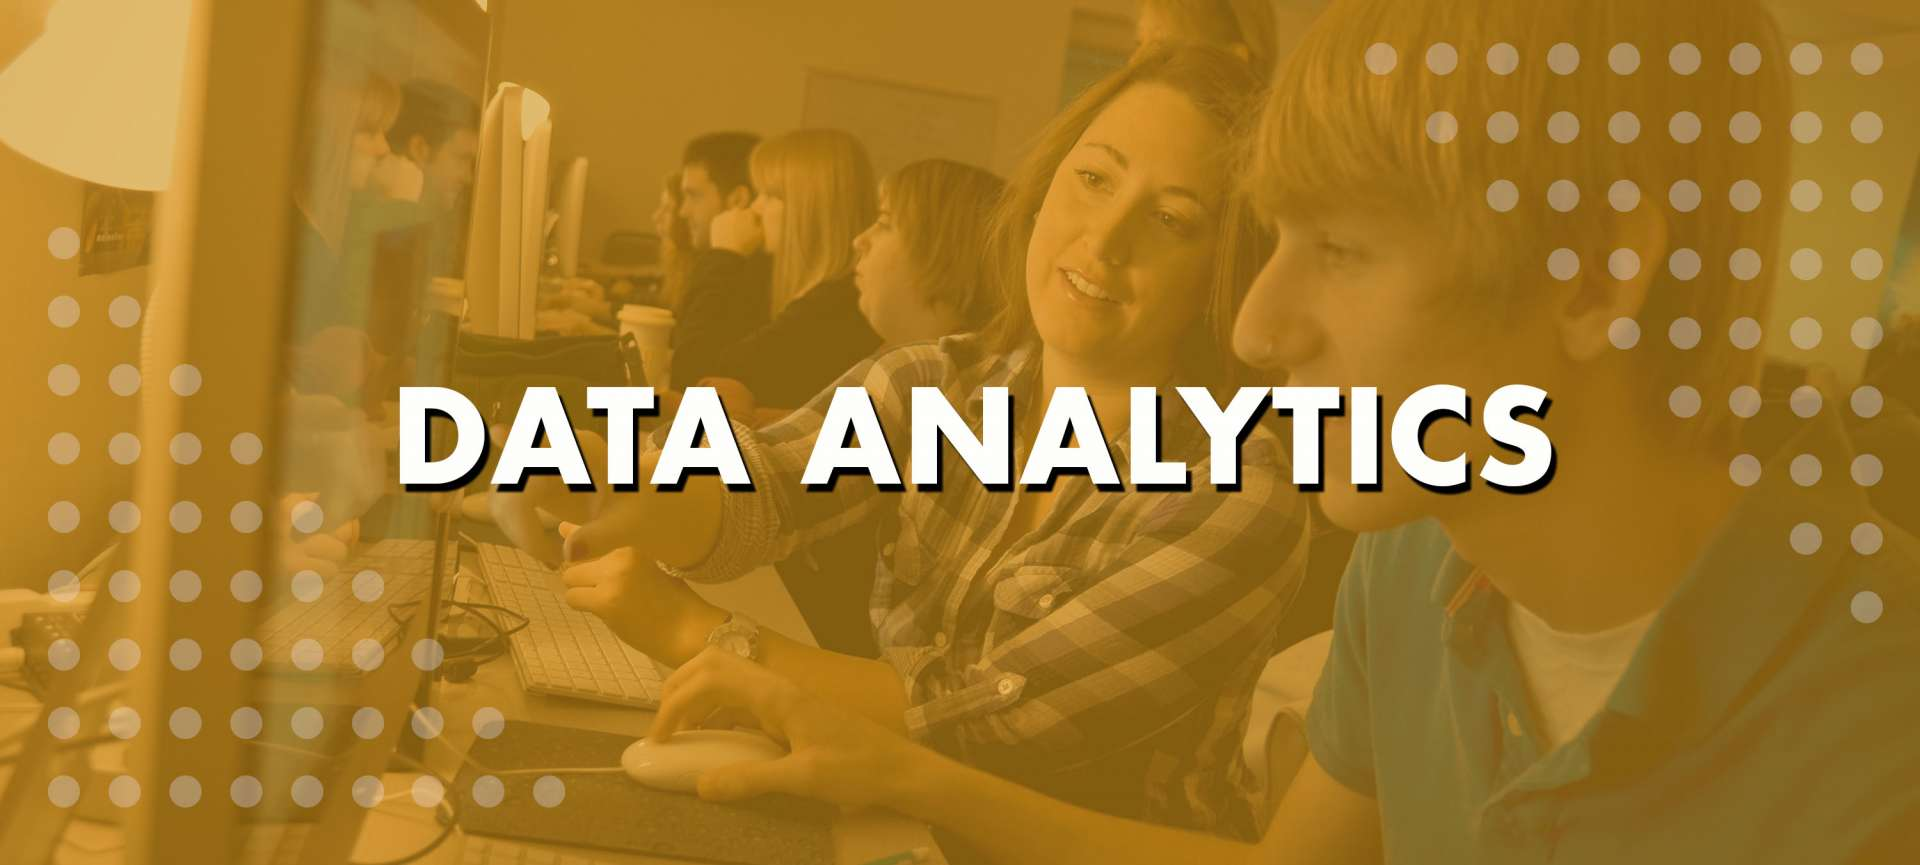 data-analytics-header